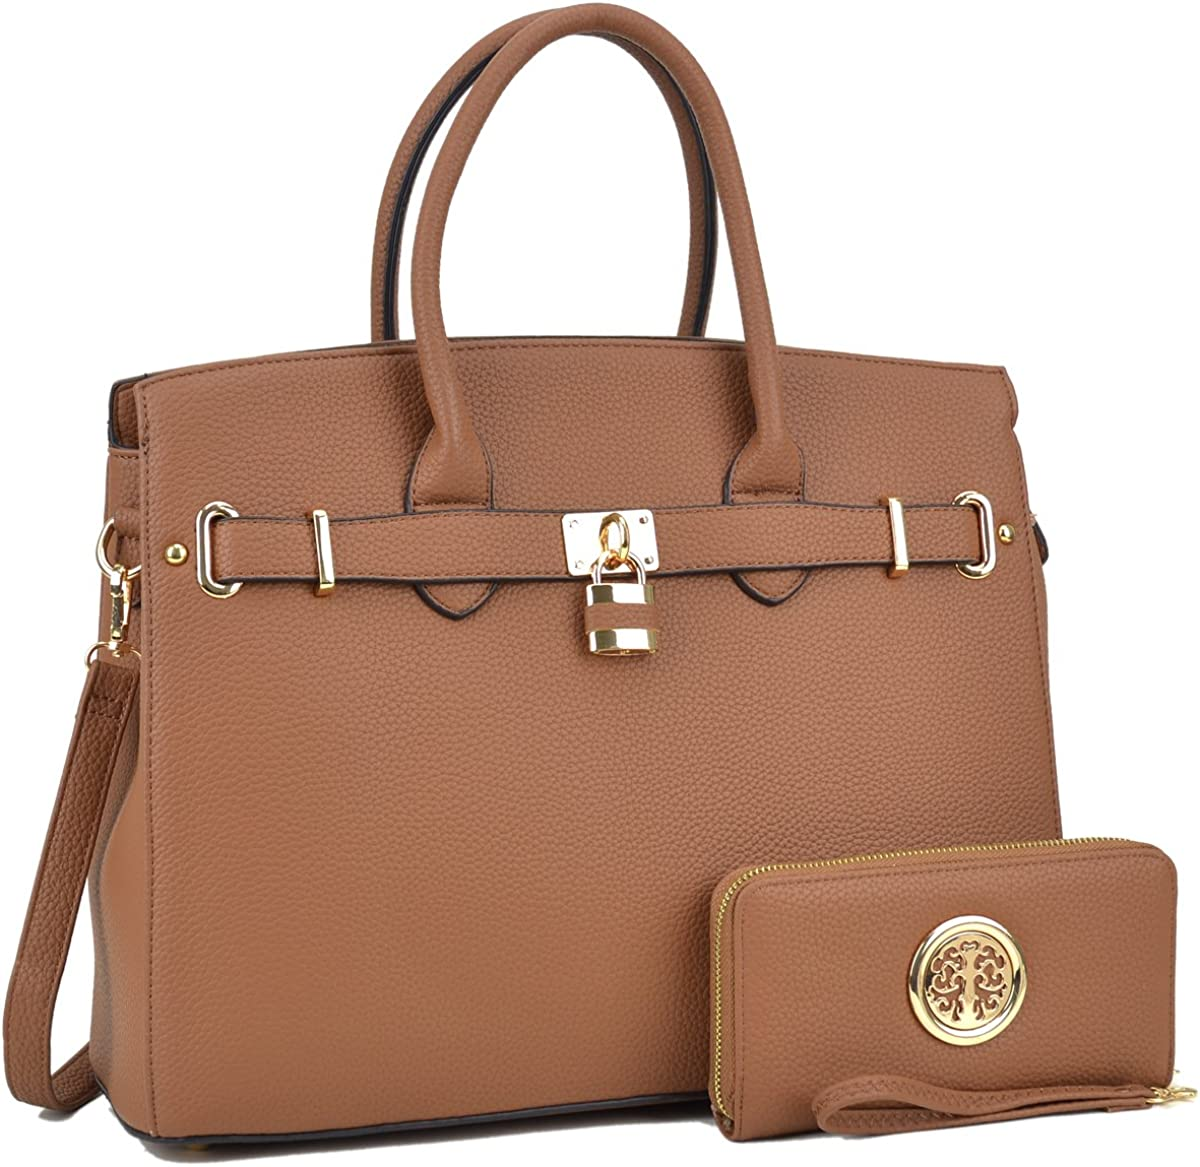 Womens Handbags Stylish Padlock Satchel Tote Handbags with Matching Wallet 2PCs